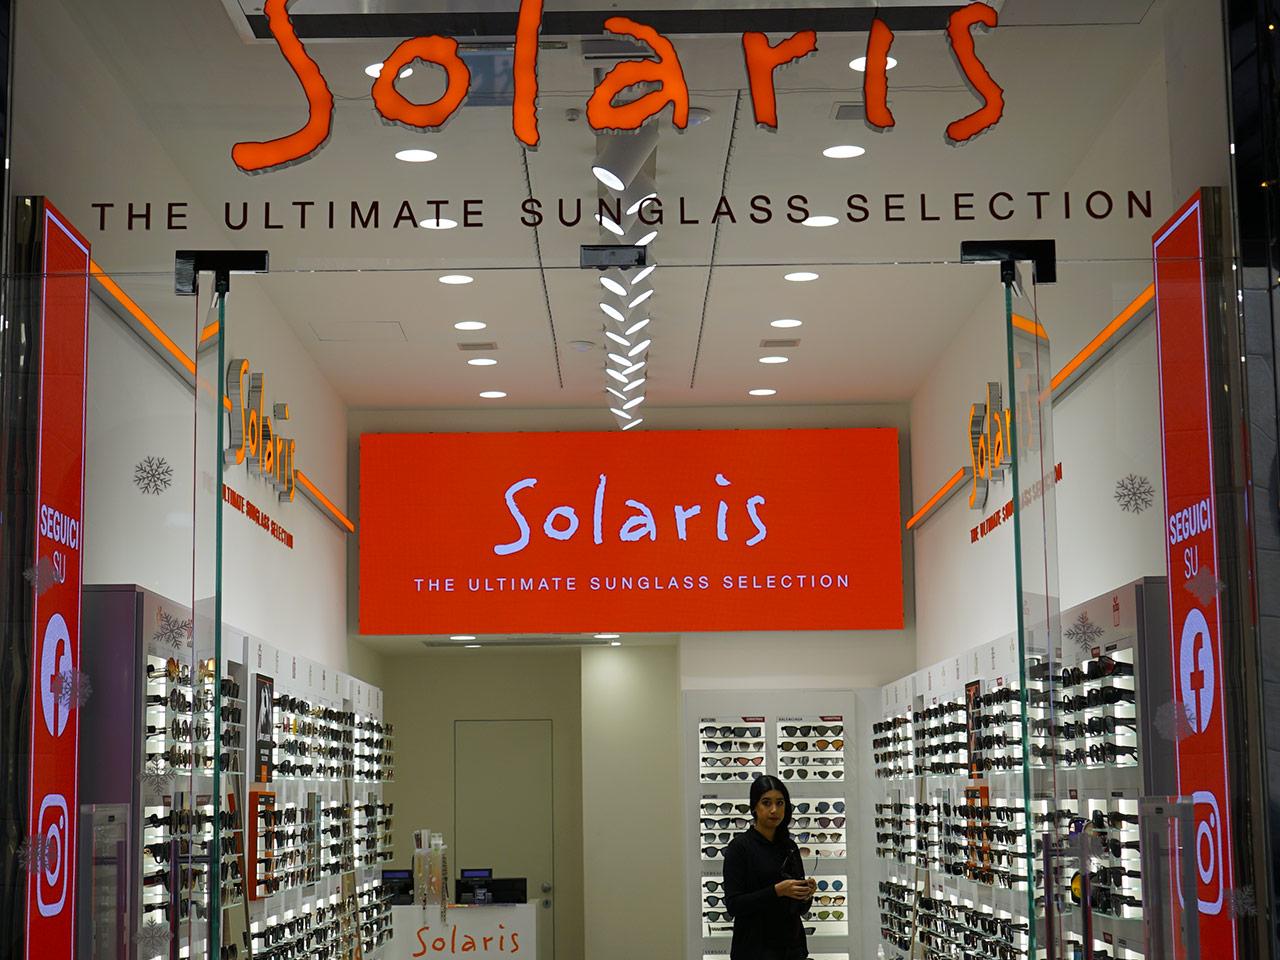 Solaris-ledwall-indoor-schermi-da-interni-fondo-store-retro-cassa-1280x960-2